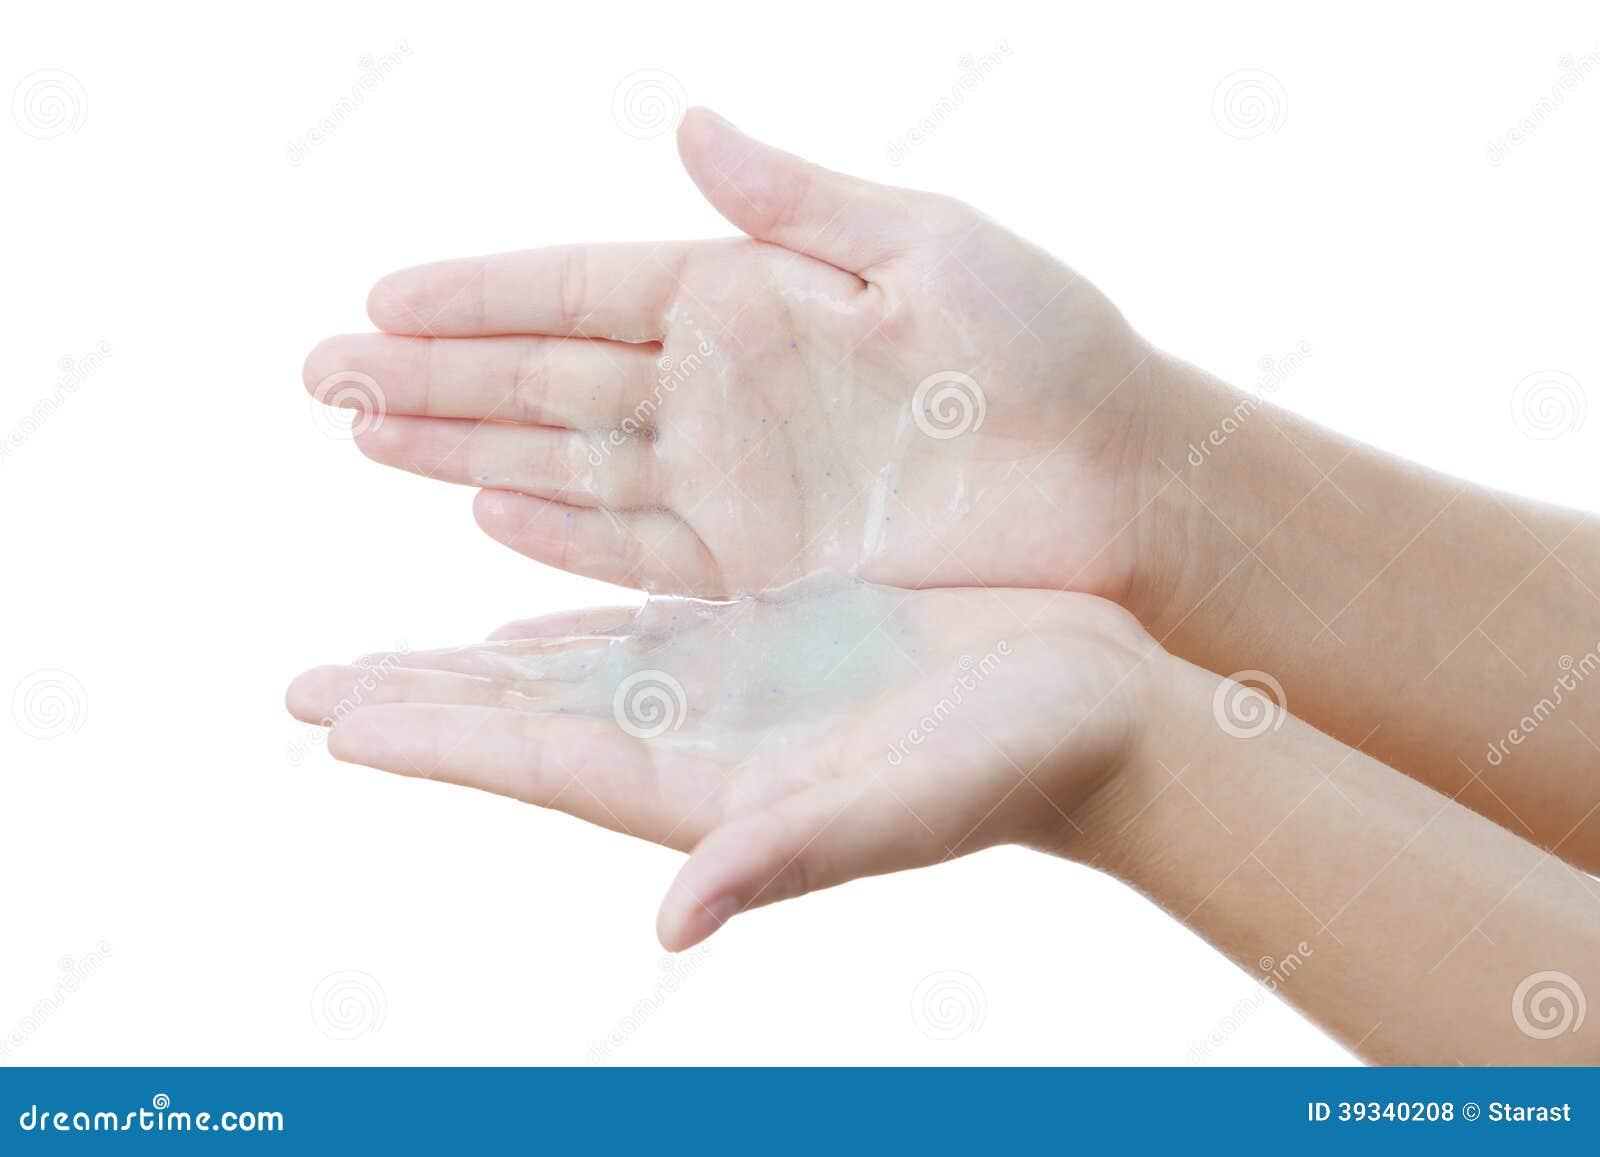 Apply Cream On Skin Hand Stock Photo - Image: 39340208